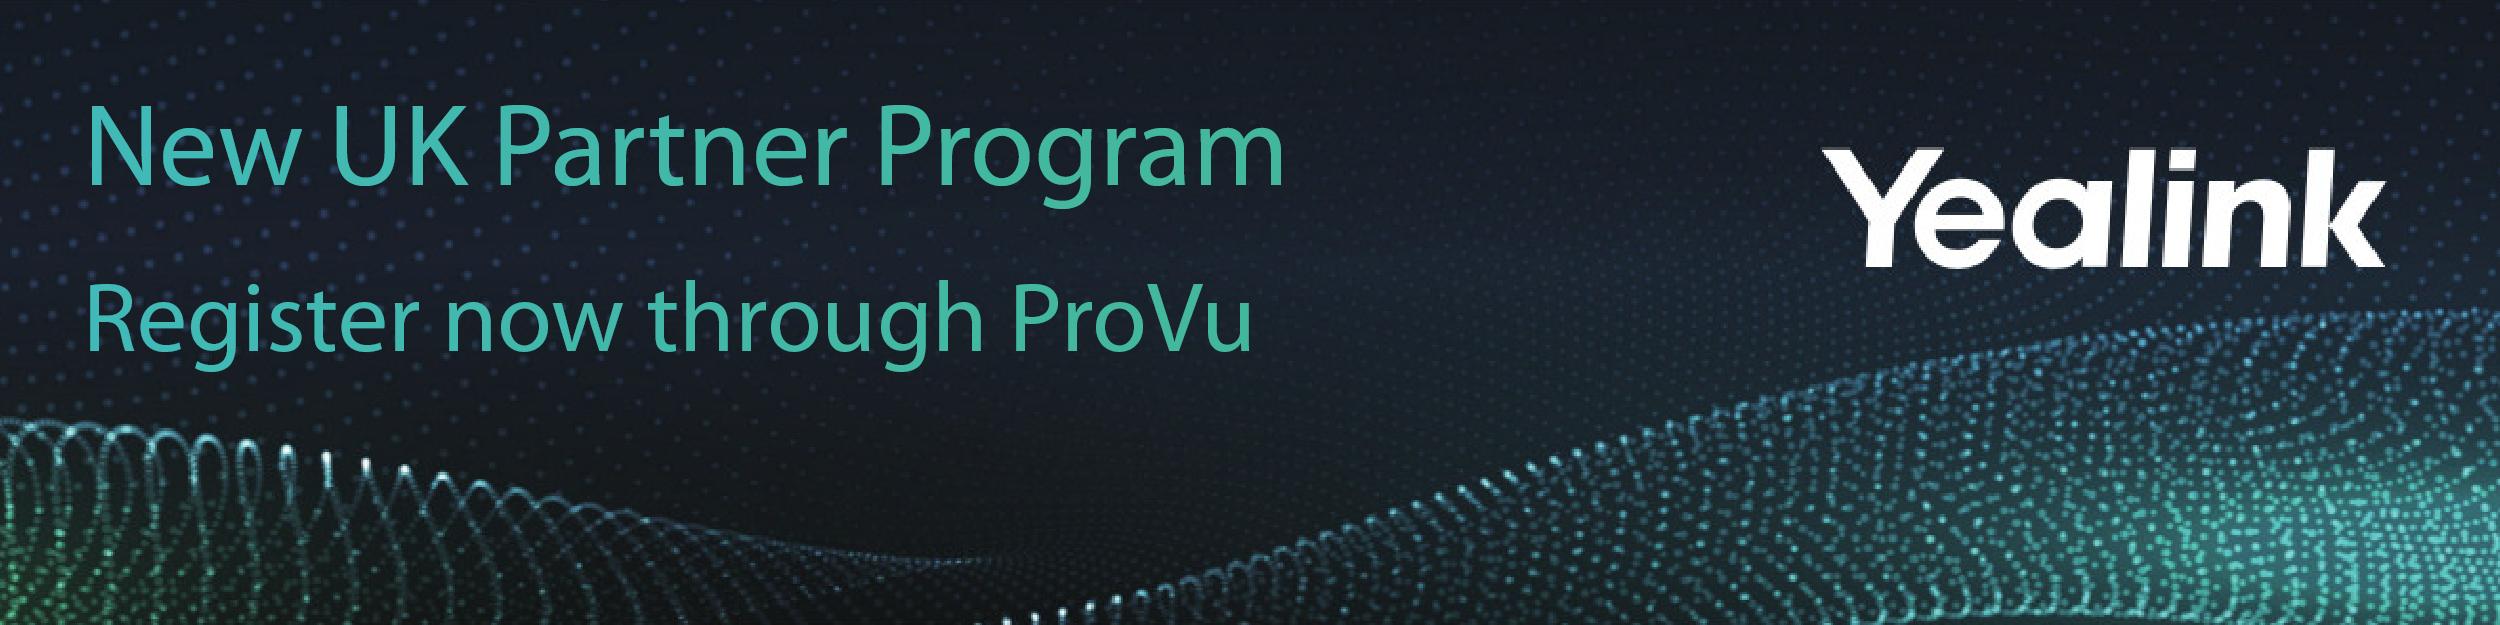 Yealink – ProVu Blog